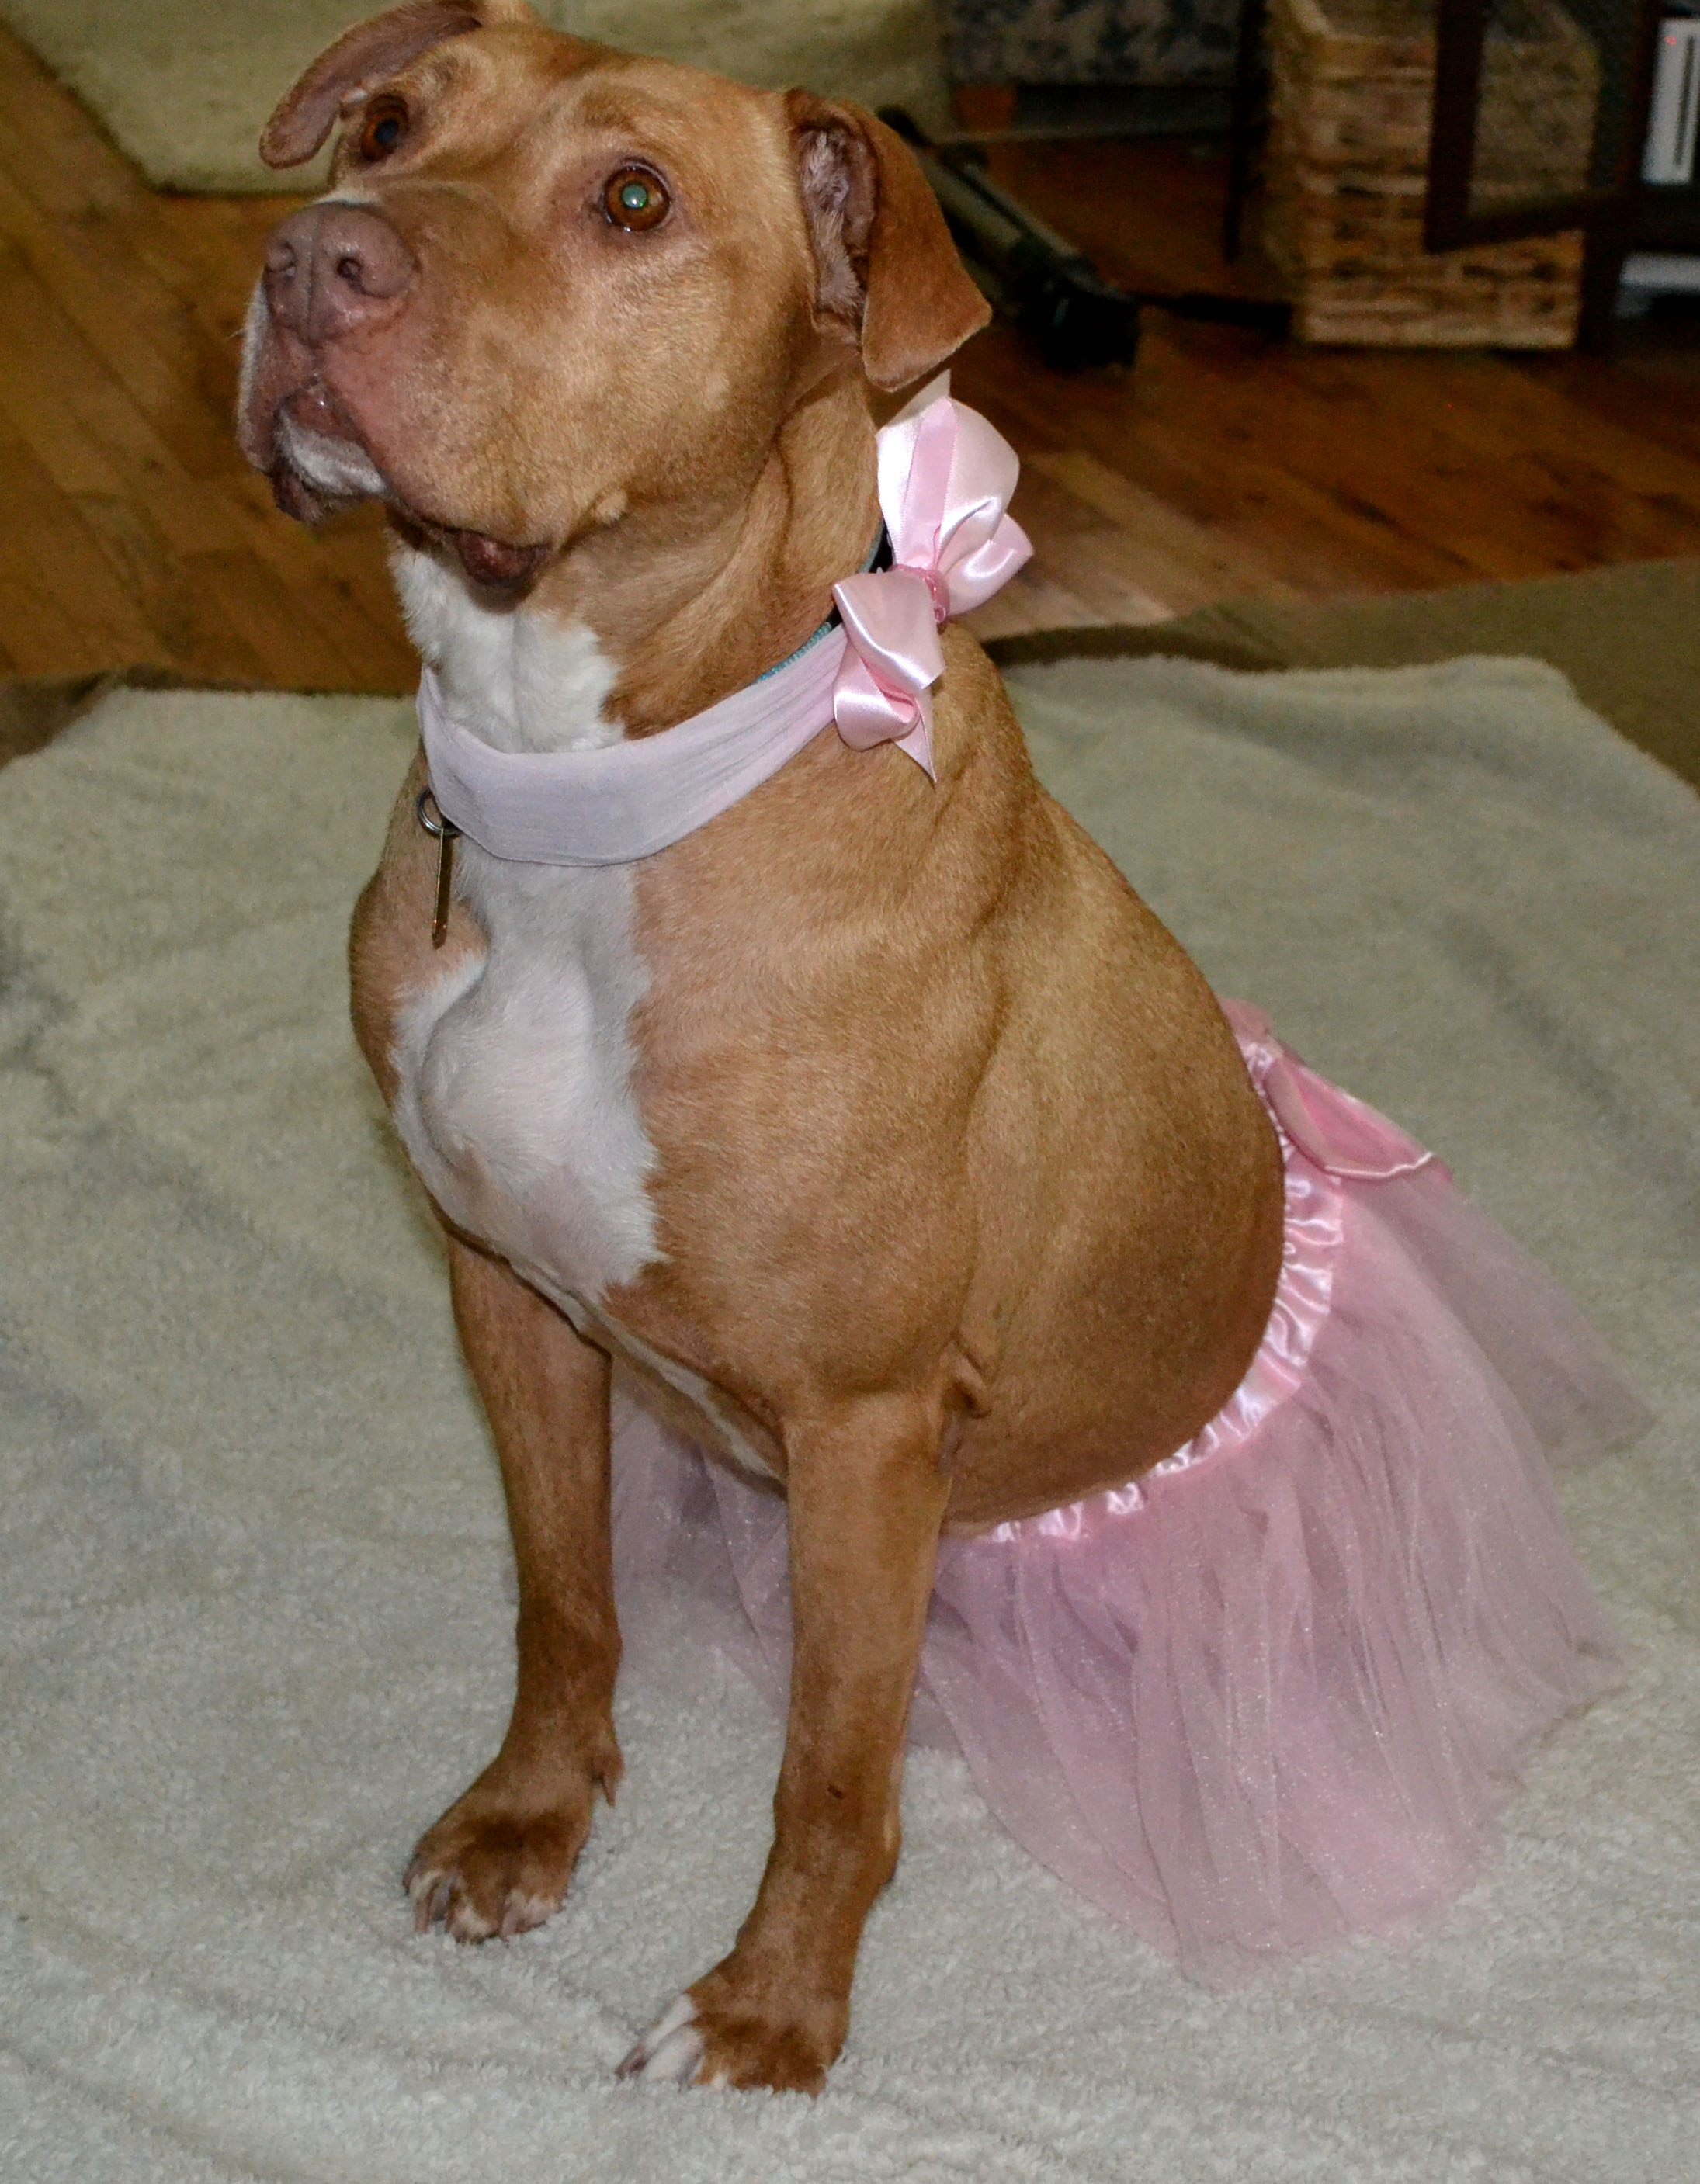 Dog Halloween Costumes | Our Waldo Bungie